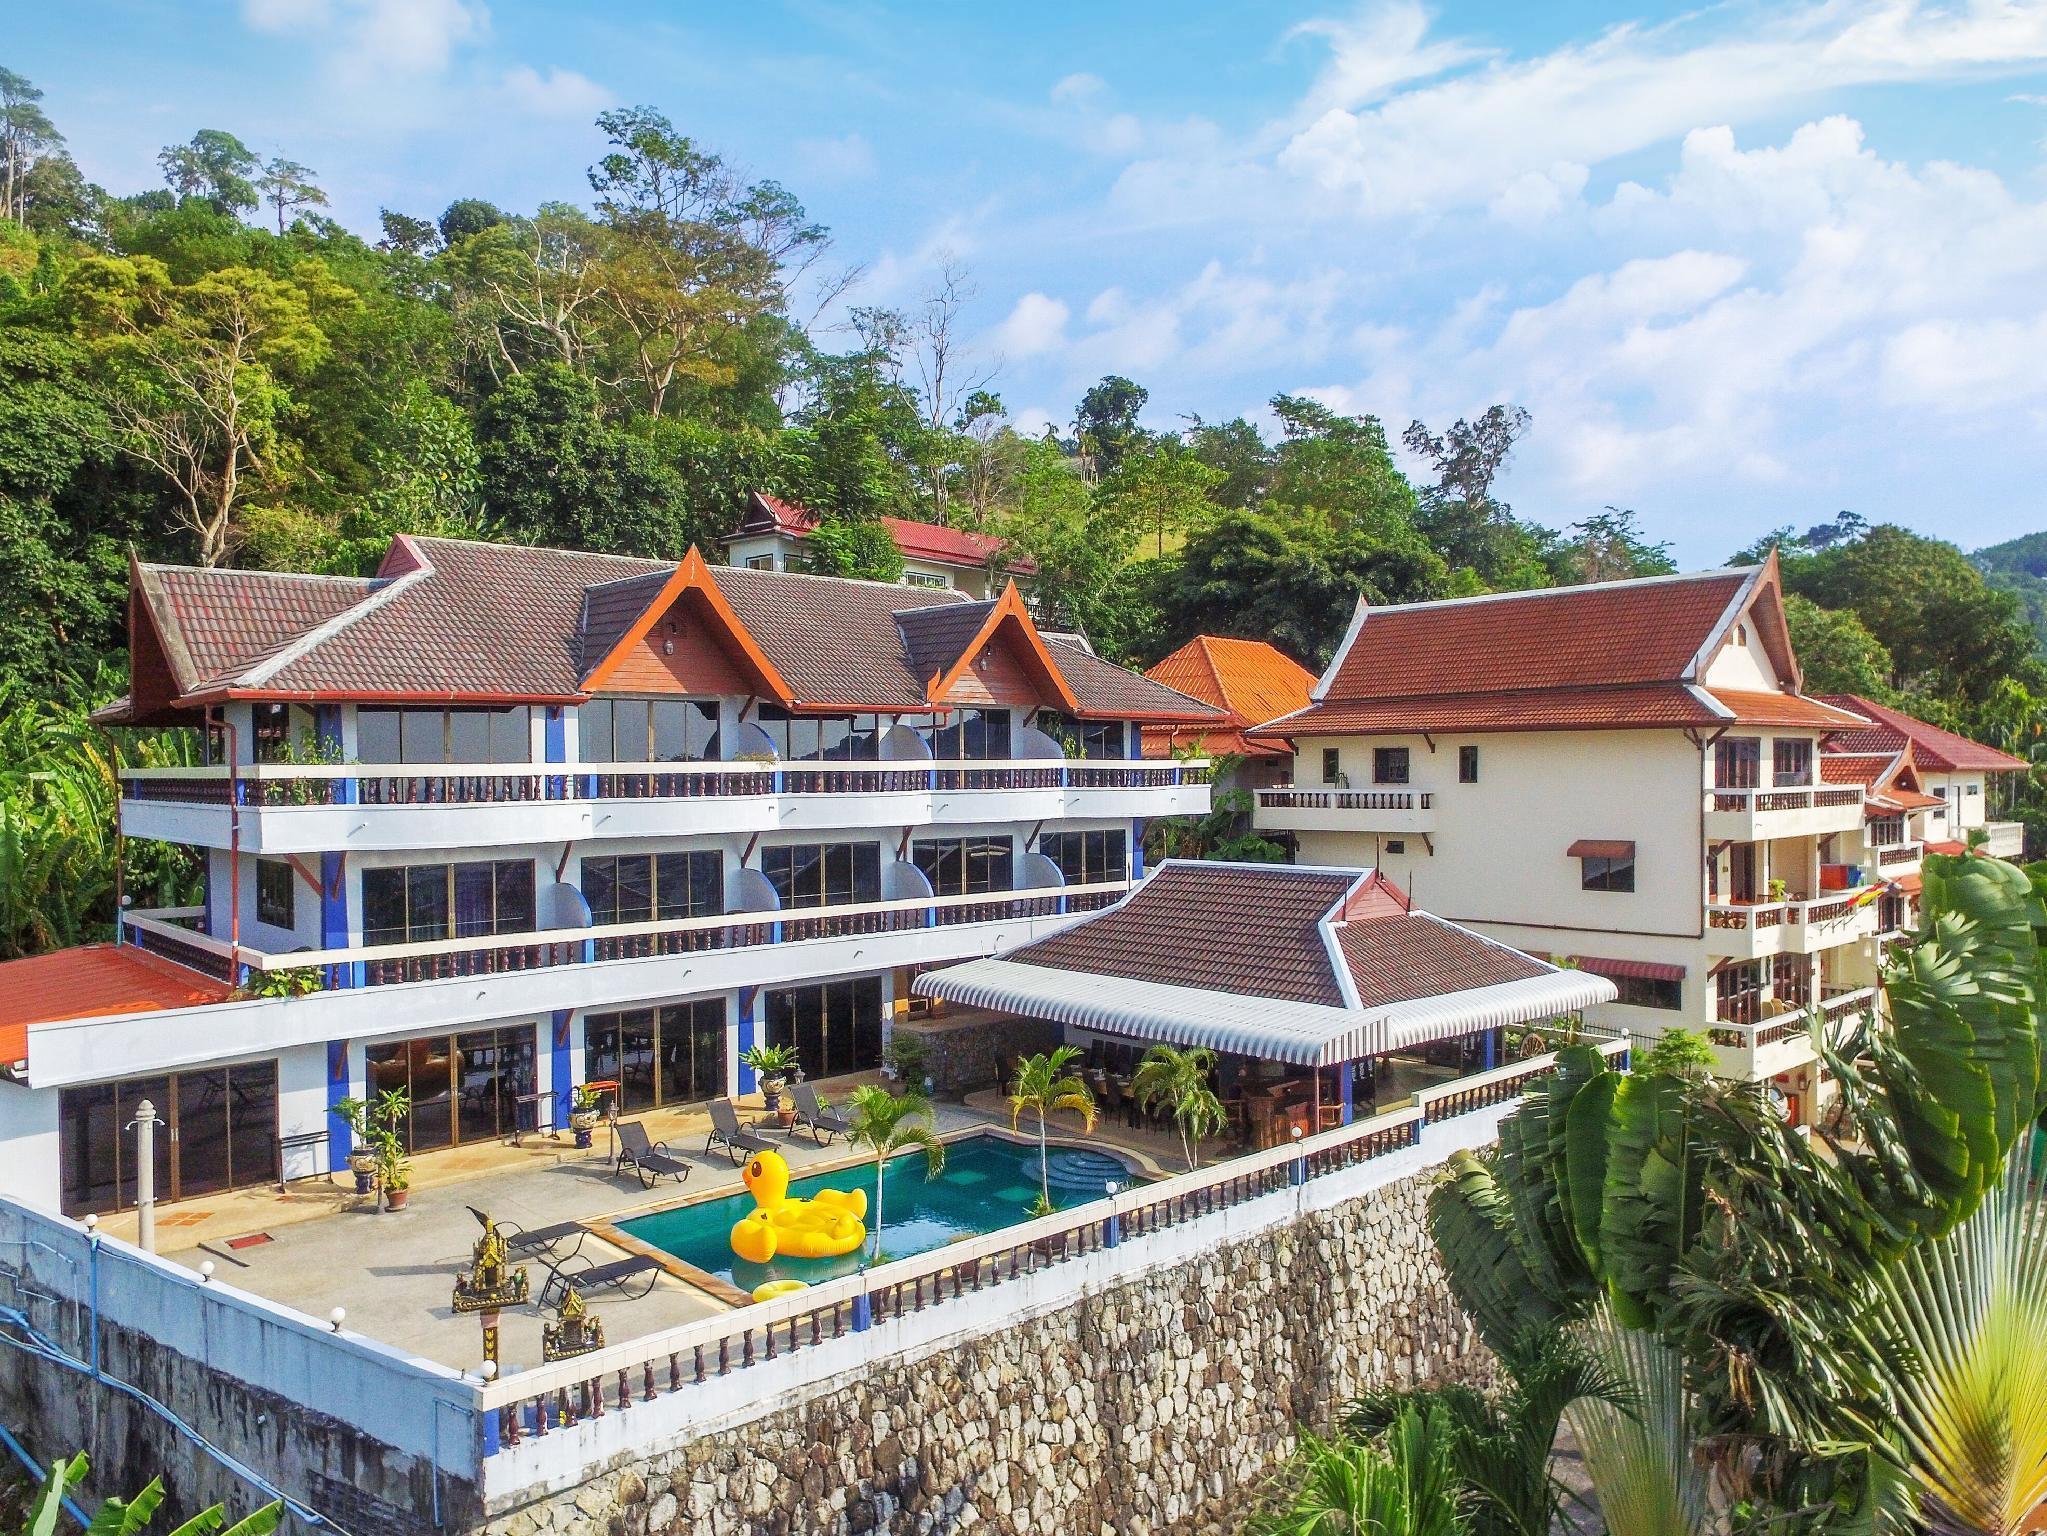 Seaview 11 Bedroom Private Pool Villa Patong Beach วิลลา 11 ห้องนอน 13 ห้องน้ำส่วนตัว ขนาด 550 ตร.ม. – ป่าตอง